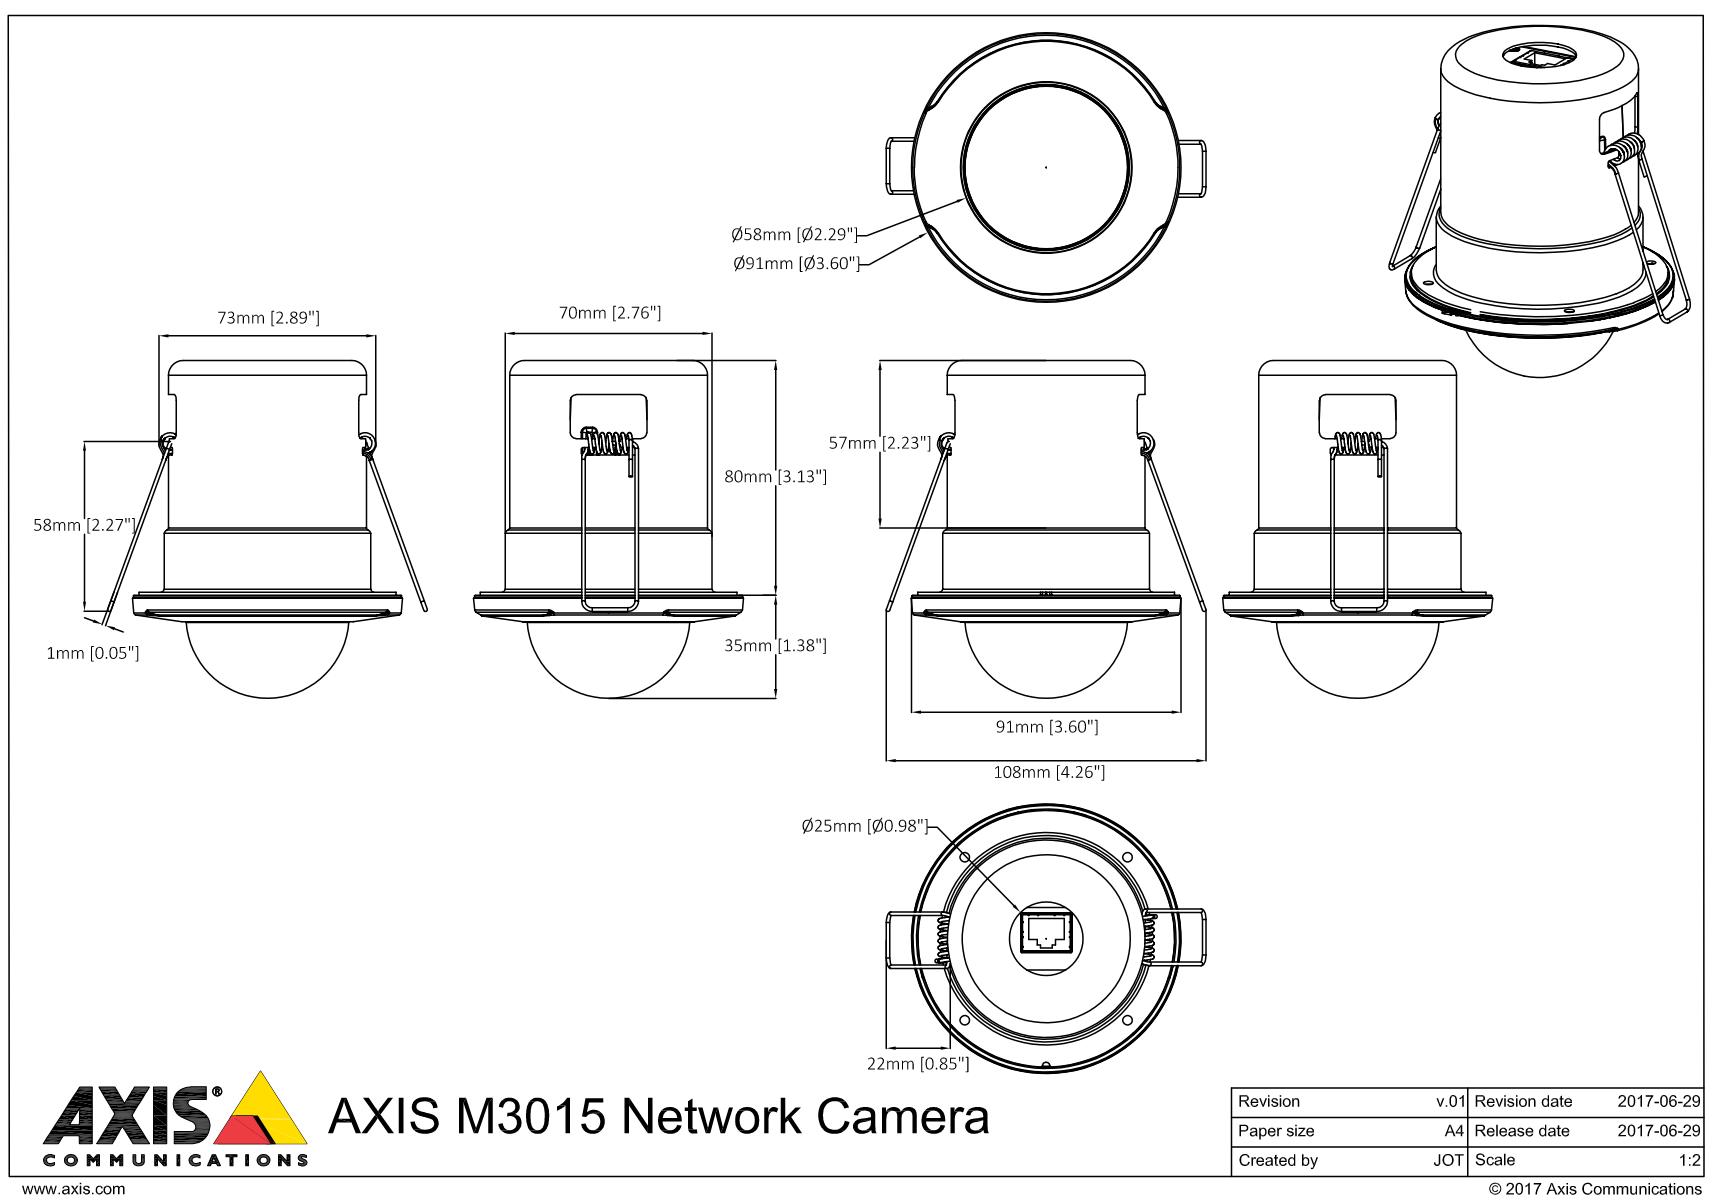 M3015 Dimensions